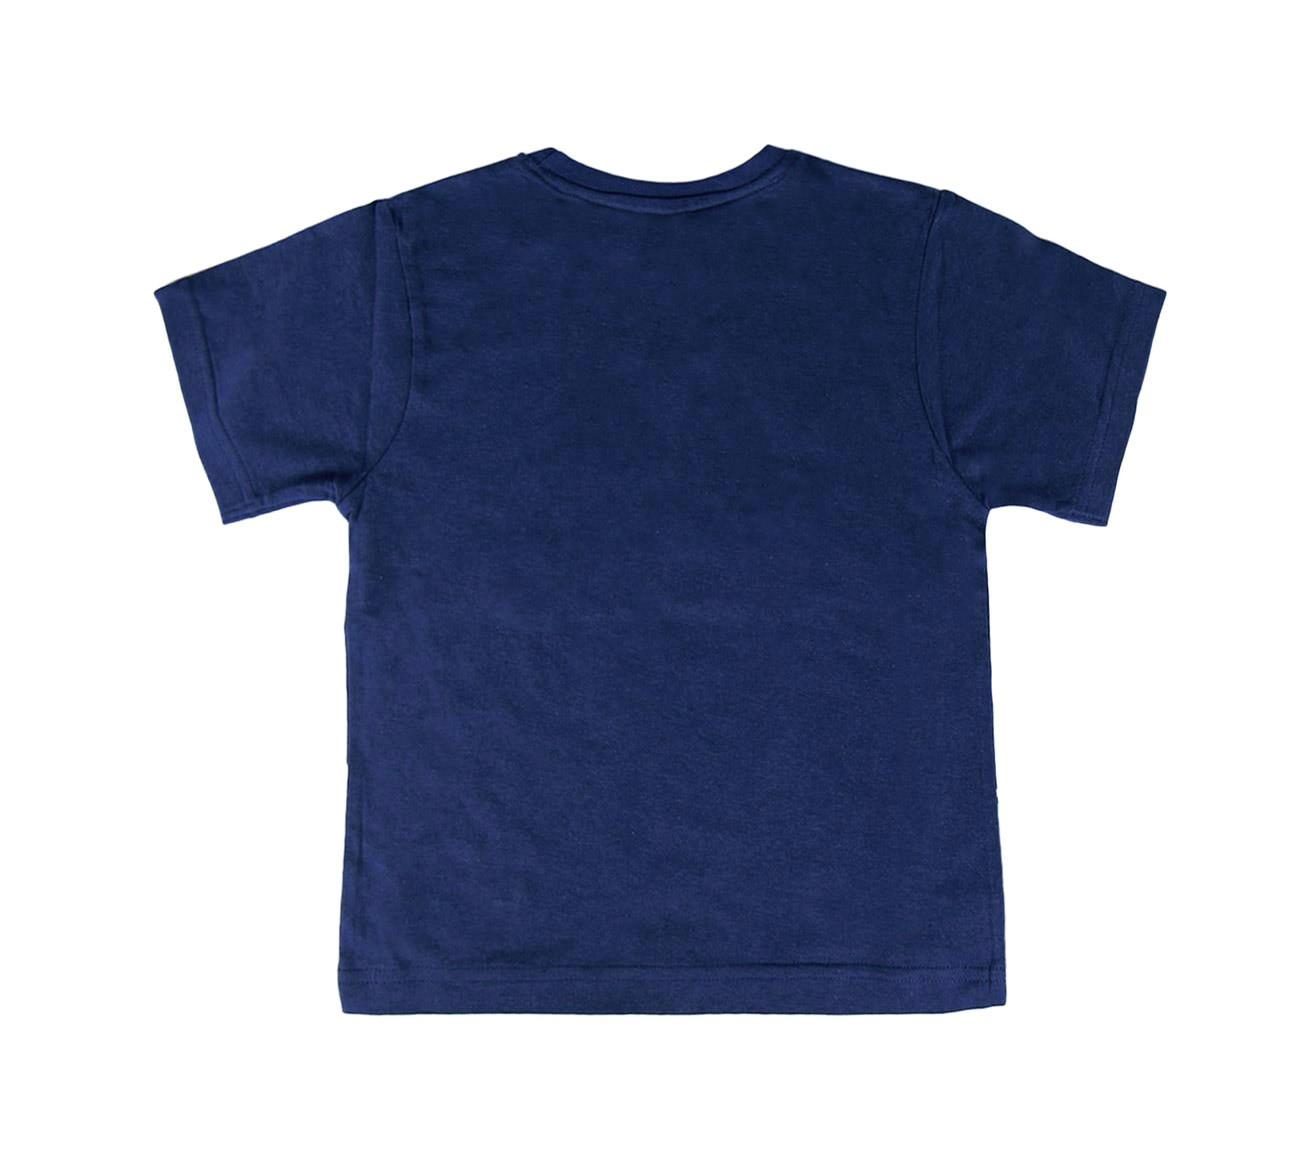 T-shirt-da-bambino-di-SPIDERMAN-2200001951-in-cotone-taglie-da-4-a-8-anni miniatura 5